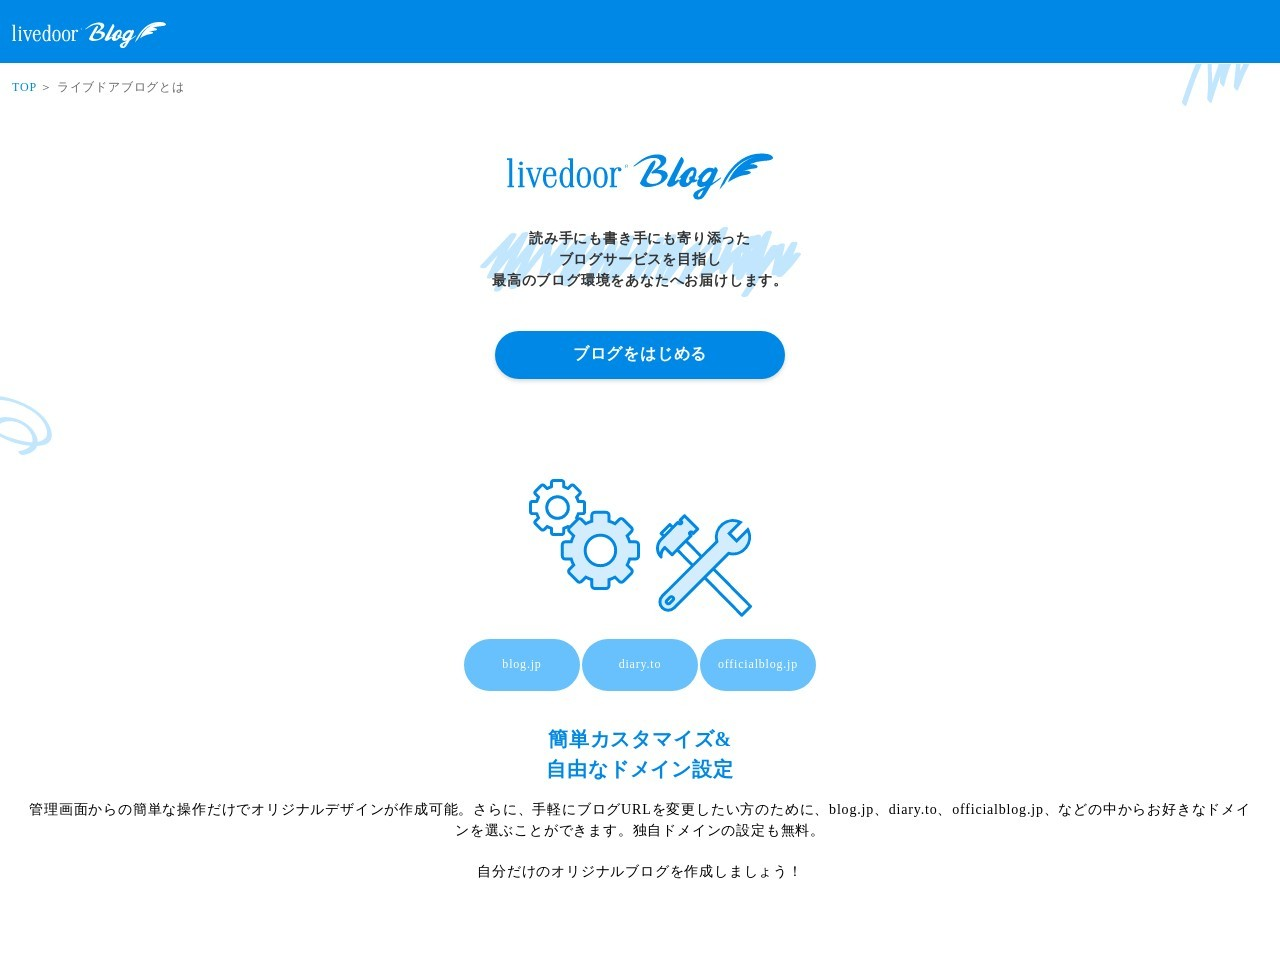 http://blog.livedoor.jp/naribe/